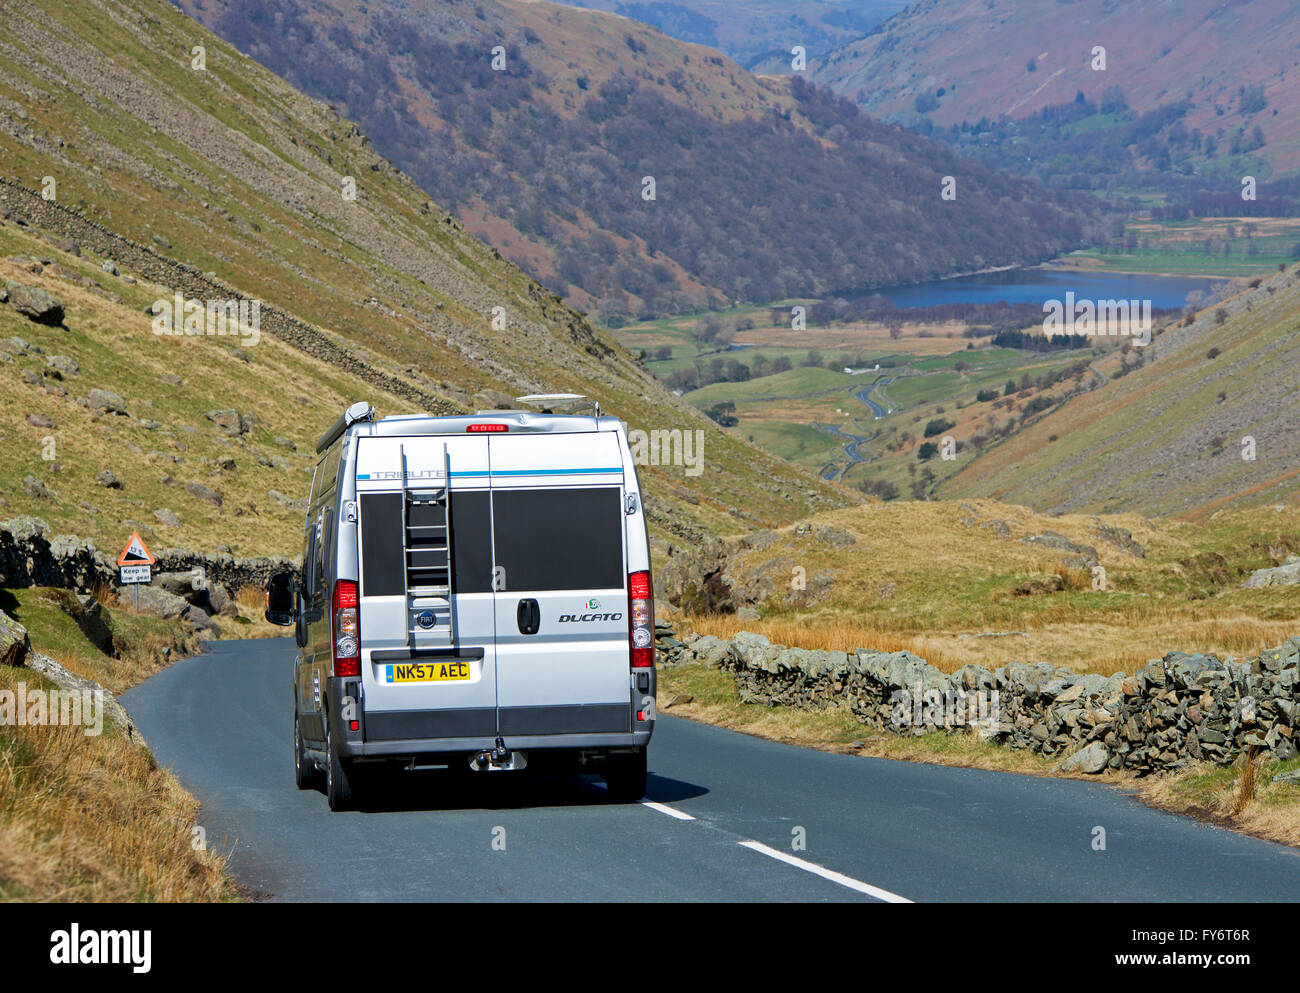 Fiat Ducato campervan on Kirkstone Pass, Lake District National Park, Cumbria, England UK - Stock Image